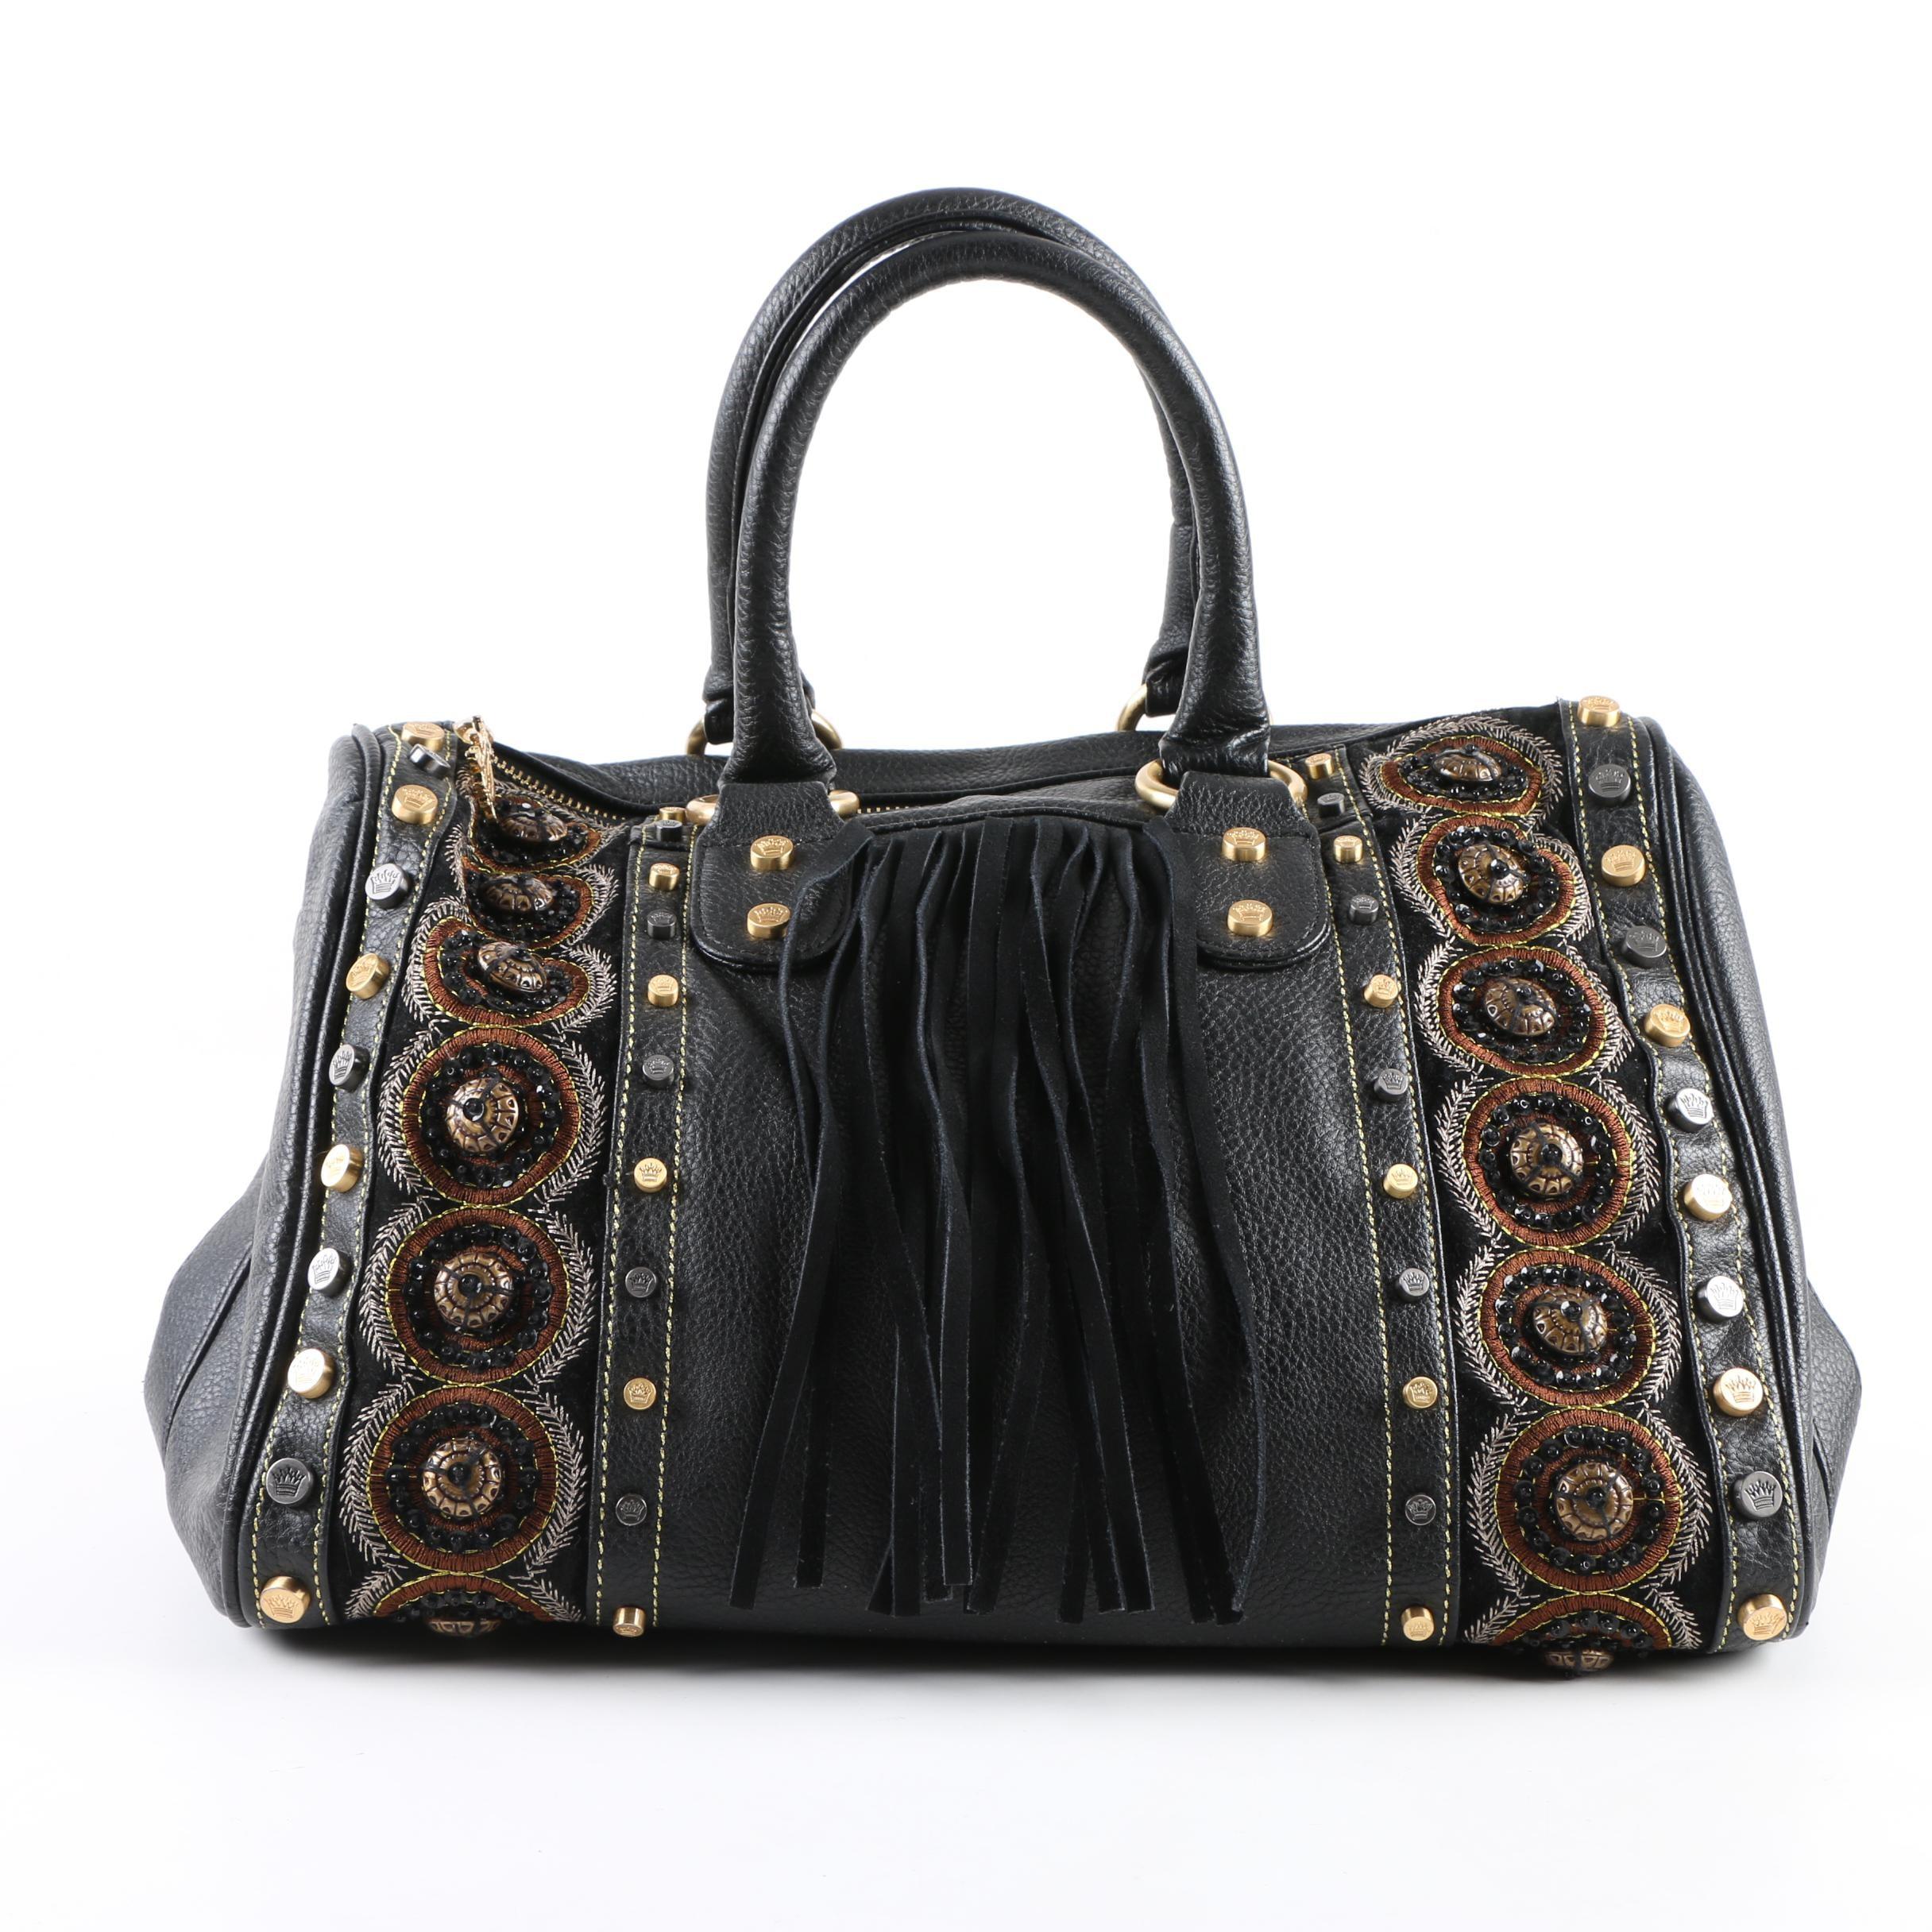 Christian Audigier Los Angeles Black Studded Handbag with Dust Cover